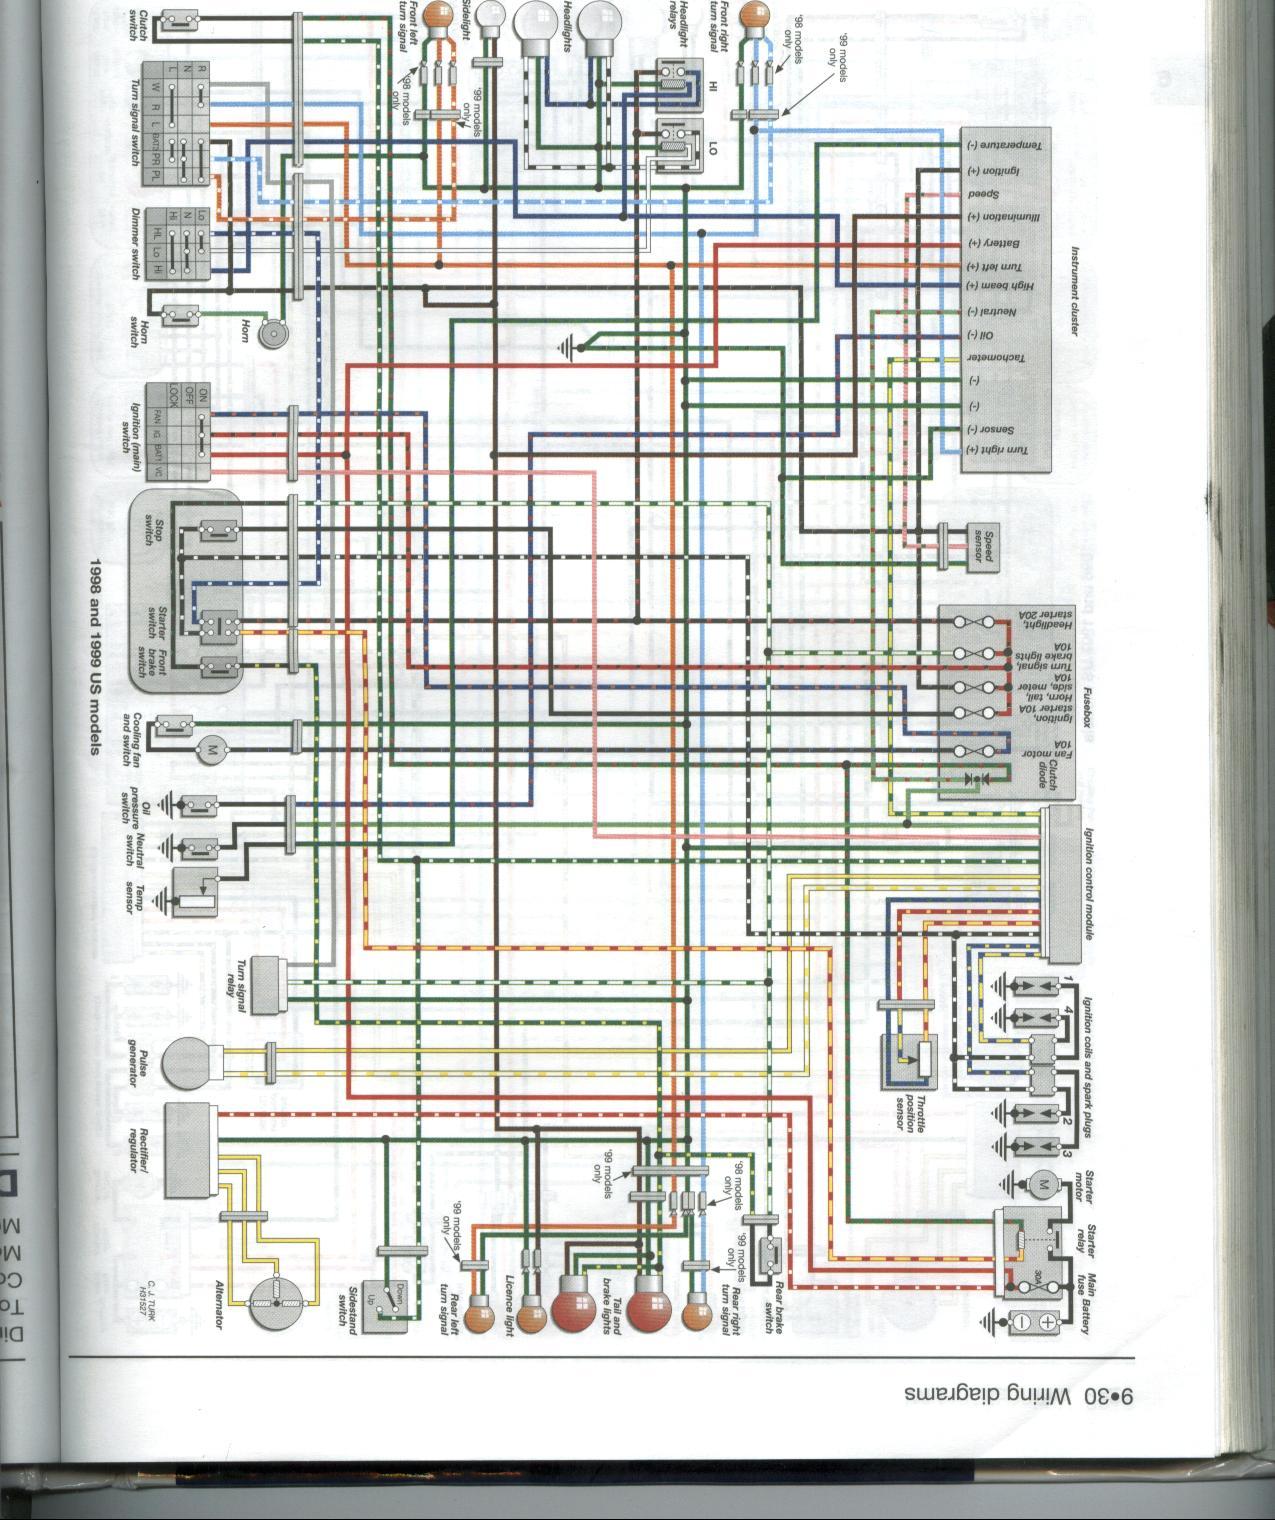 [SCHEMATICS_4FR]  wiring diagrams 93-95,98-99 900rr | Honda Motorcycles - FireBlades.org | Honda 919 Wiring Diagram |  | FireBlades.org